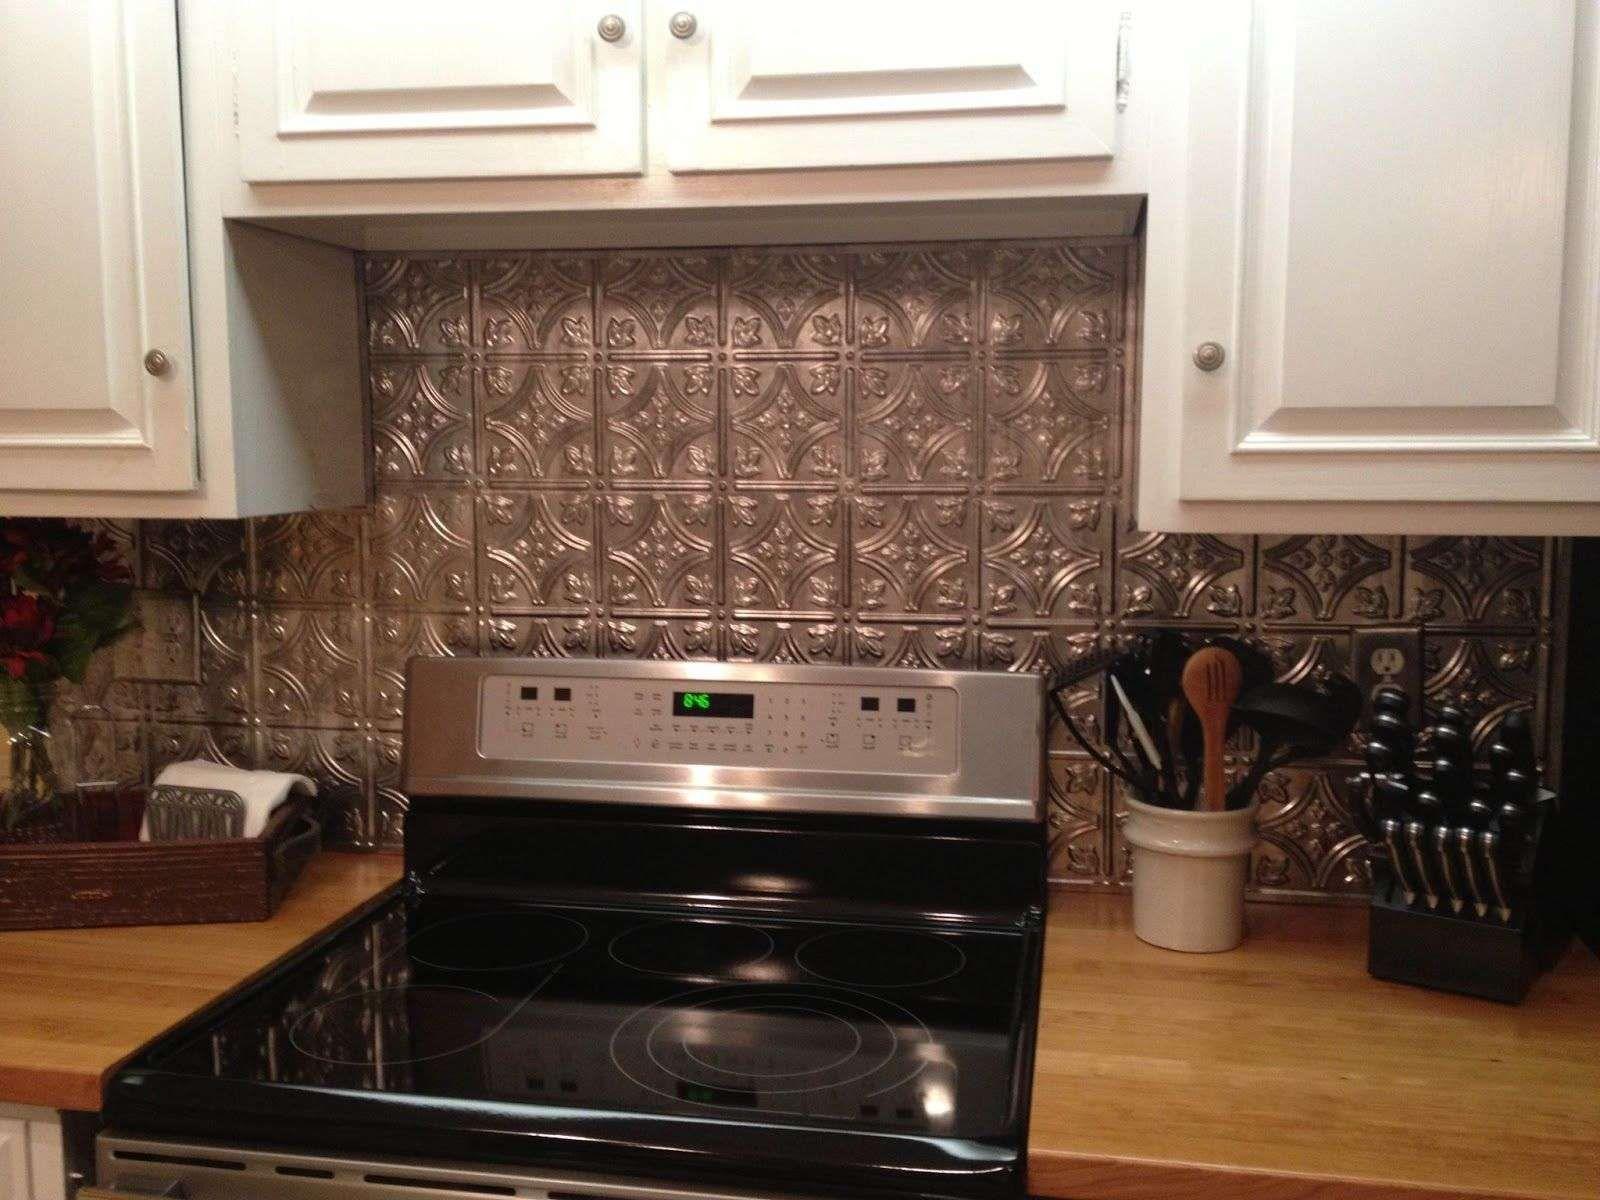 9 Faux Metal Kitchen Backsplash Collections Tin Backsplash Kitchen Metallic Backsplash Tin Backsplash